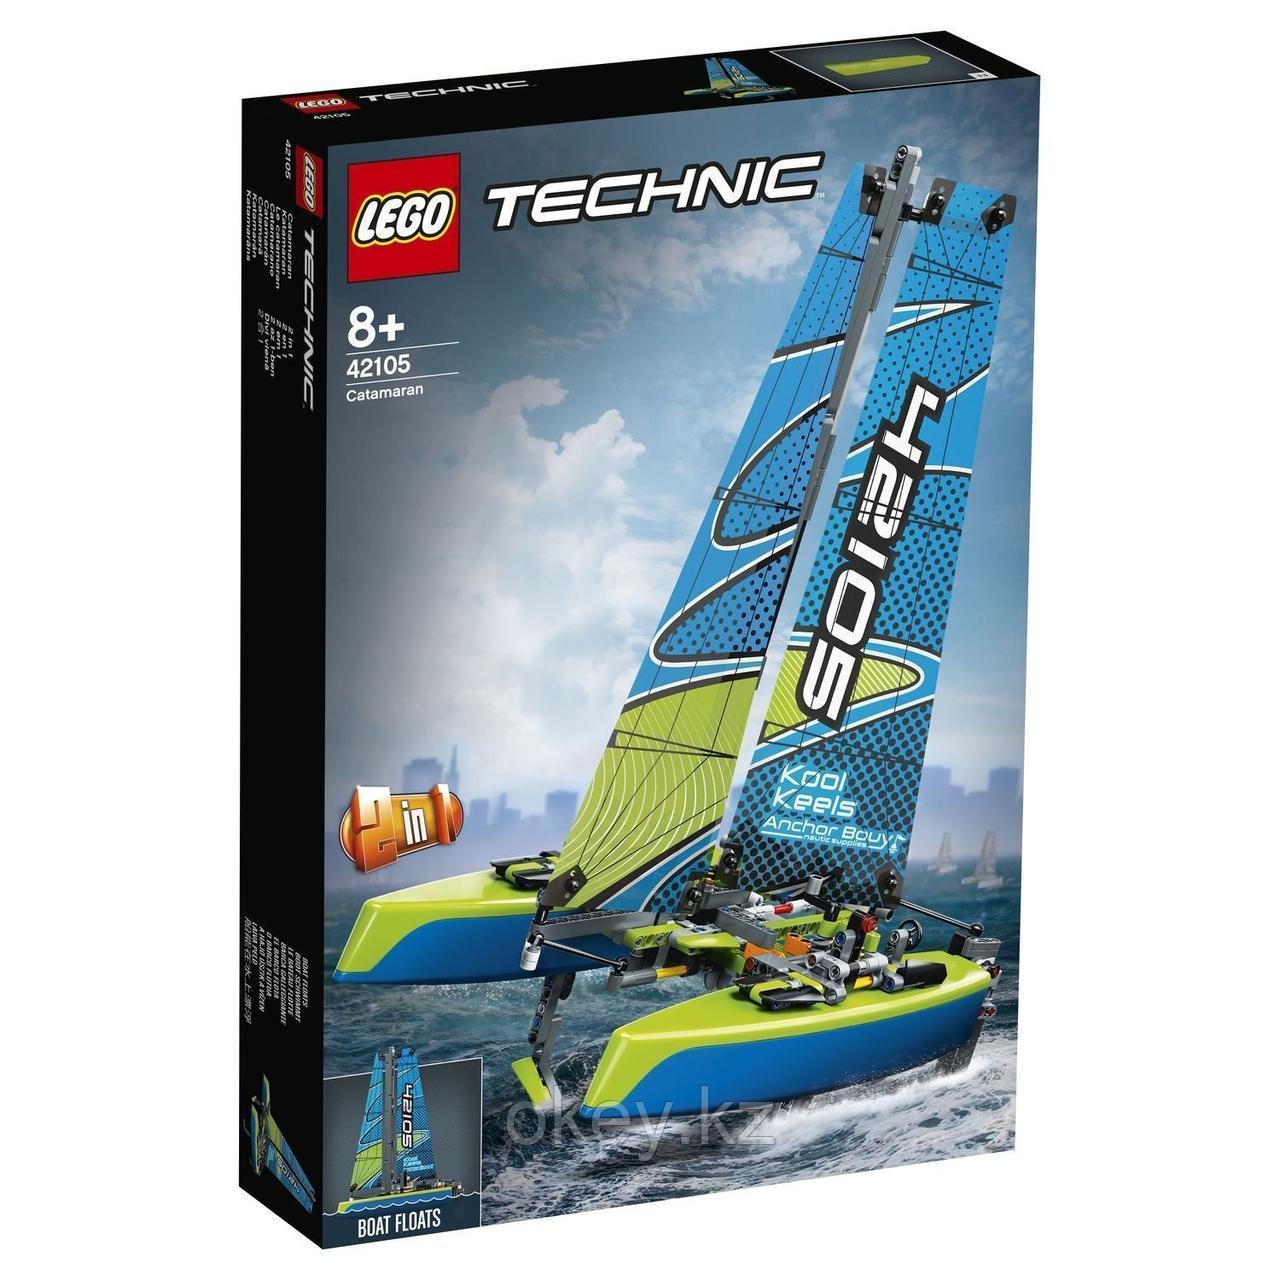 LEGO Technic: Катамаран 42105